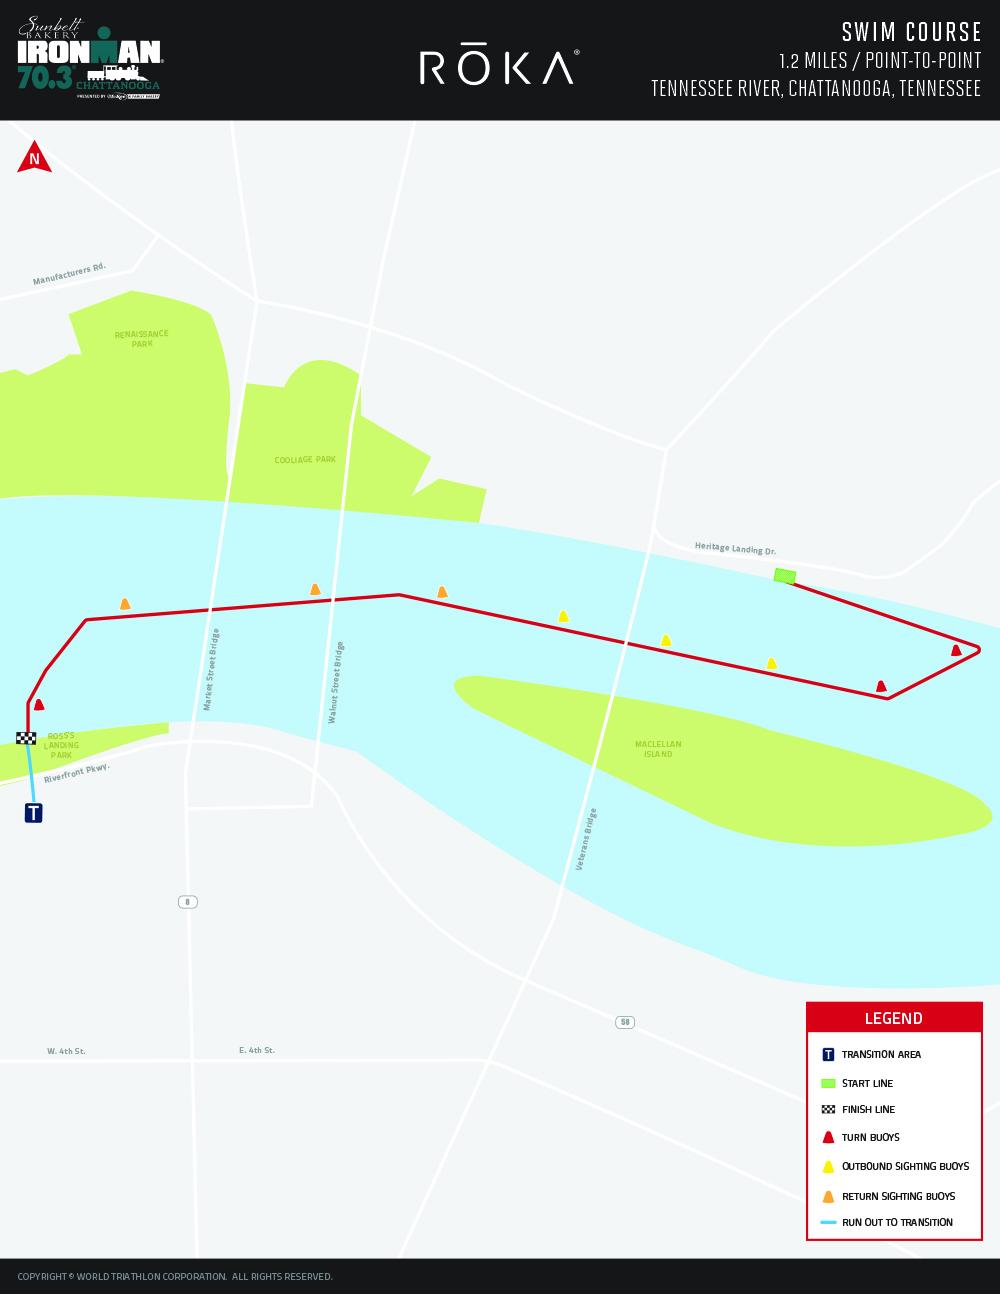 SWIMim 703chatt19 coursemap swim 41119 cc web 1.jpg